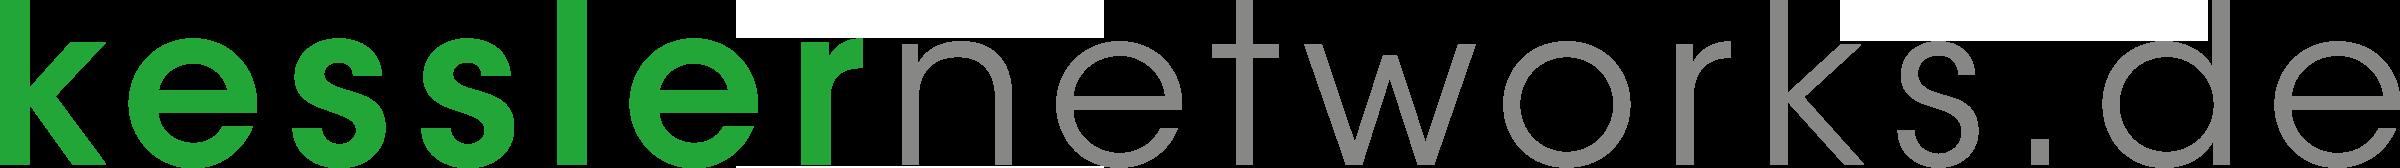 kes_logo_positiv-1